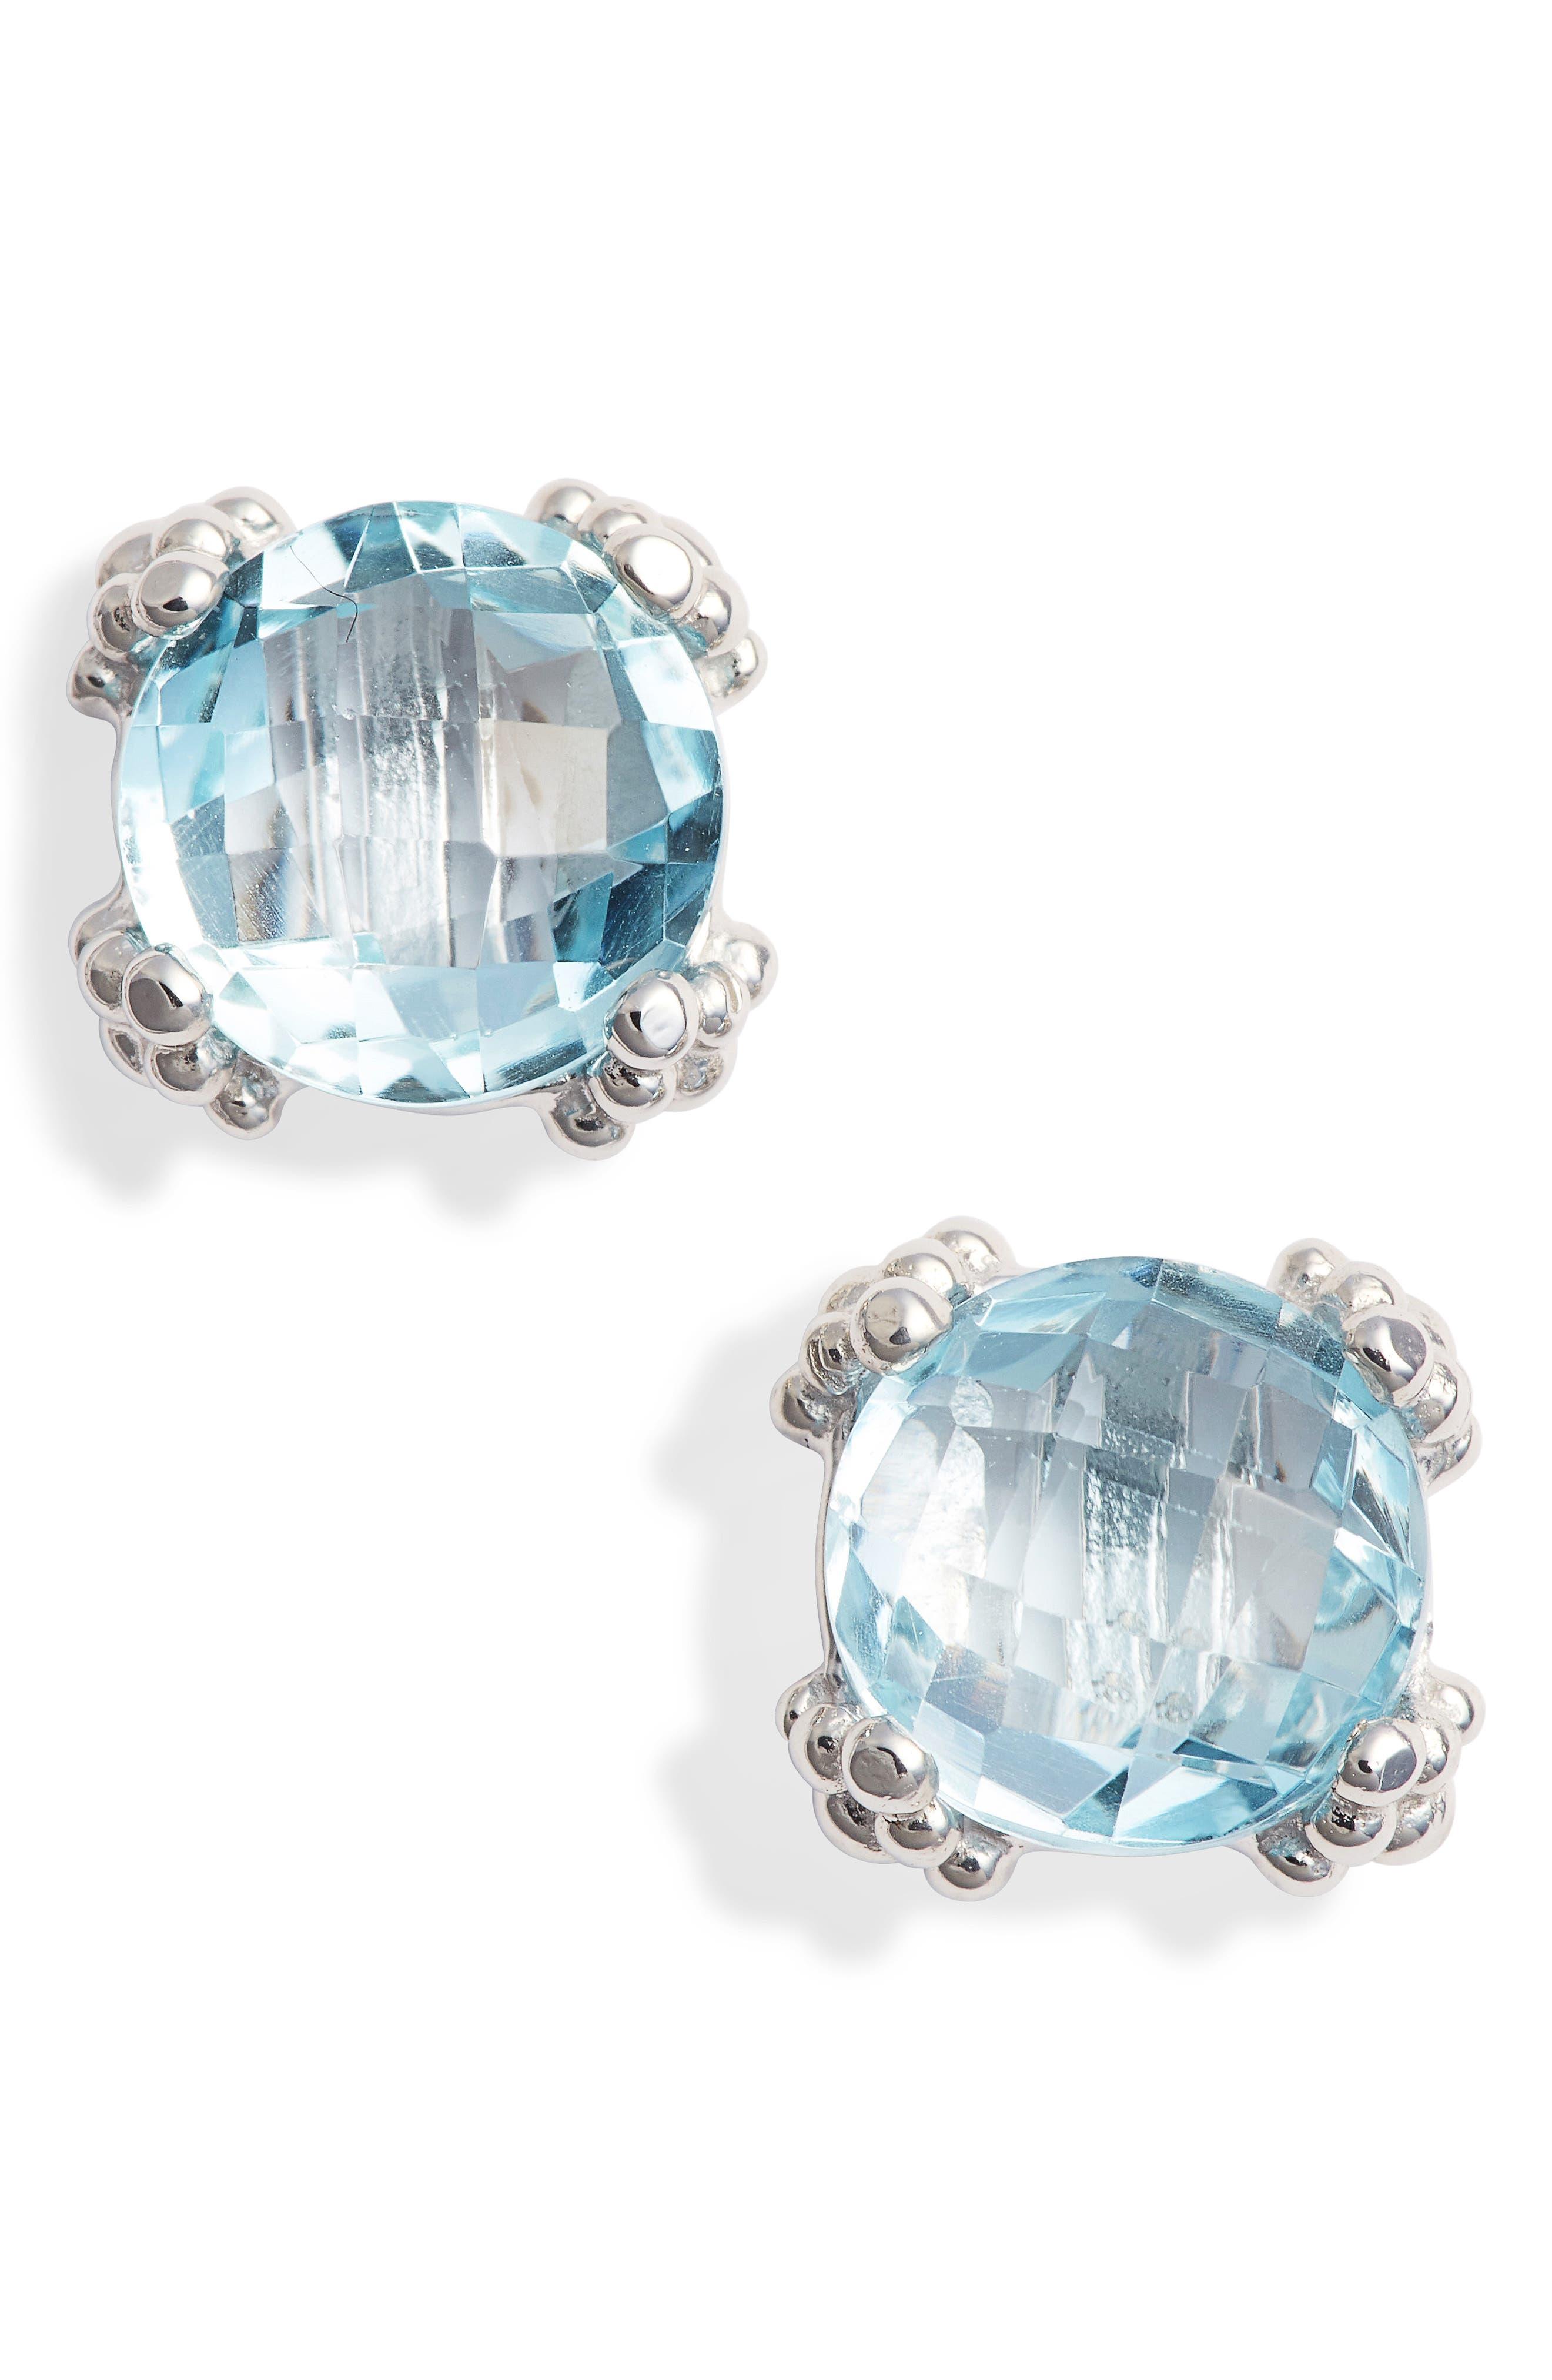 Small Cluster Topaz Stud Earrings